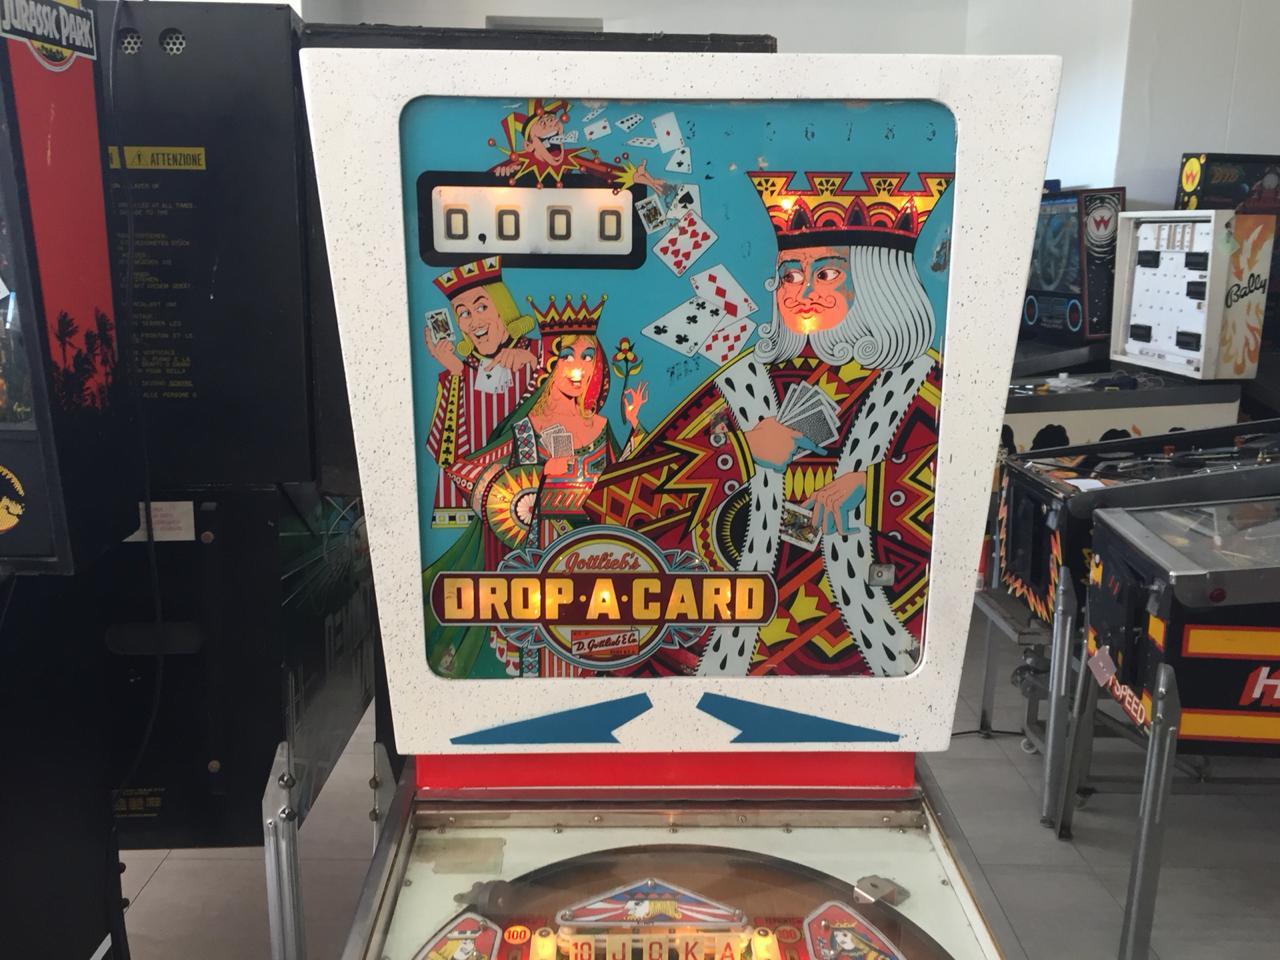 Drop-A-Card Pinball Machine for sale | Junk Mail